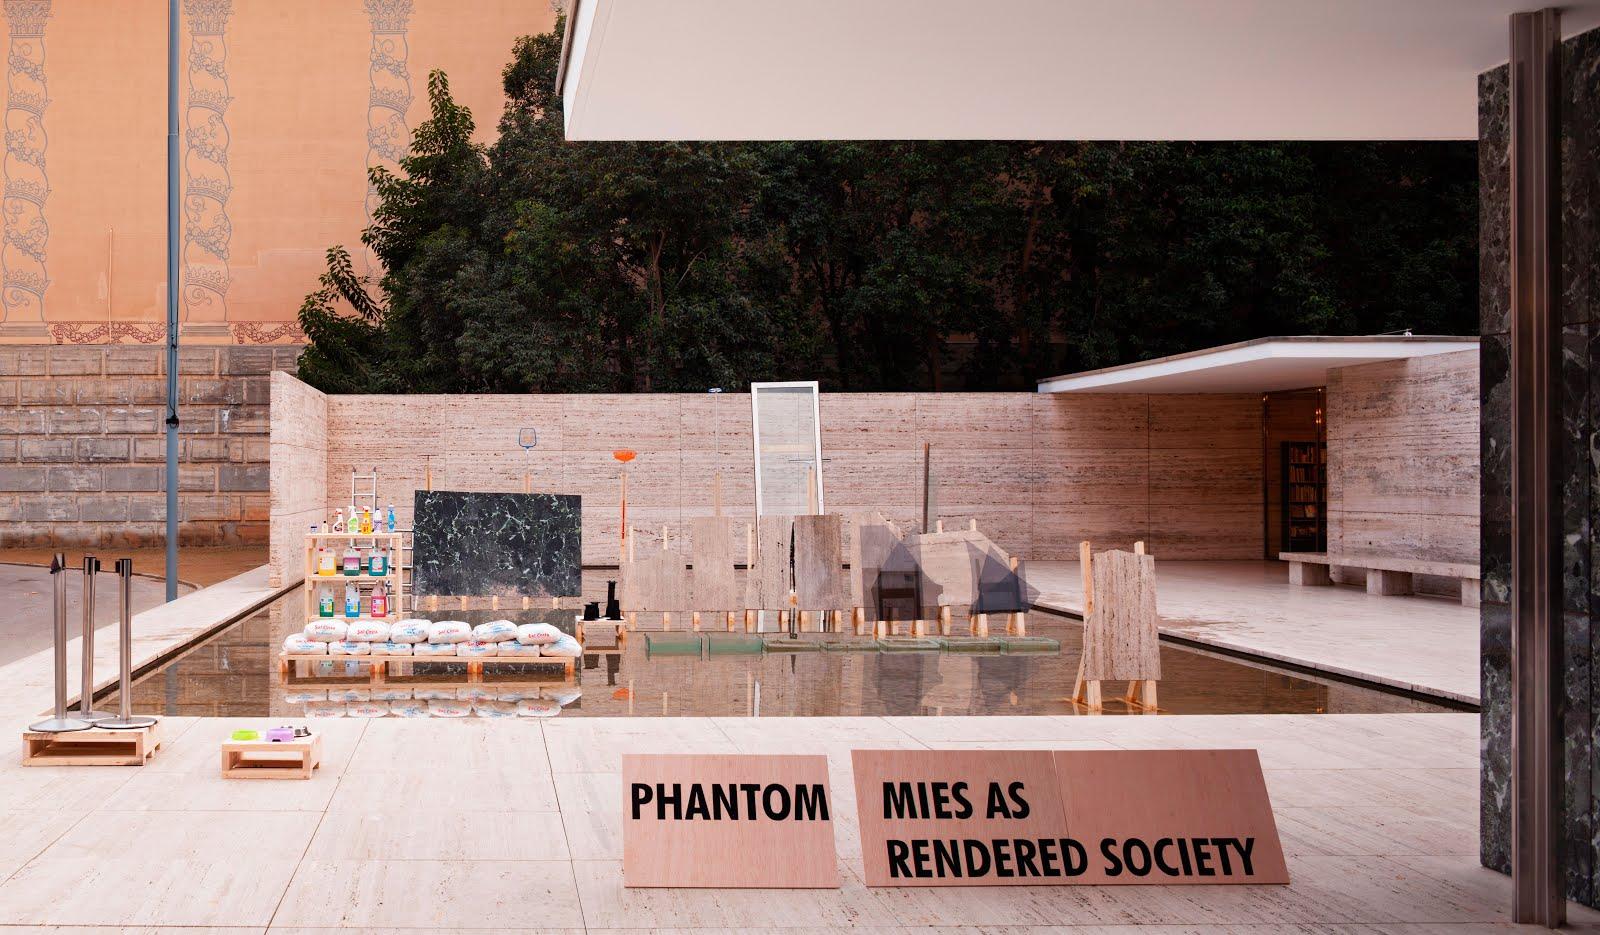 PHANTOM. MIES AS RENDERED SOCIETY, Barcelona